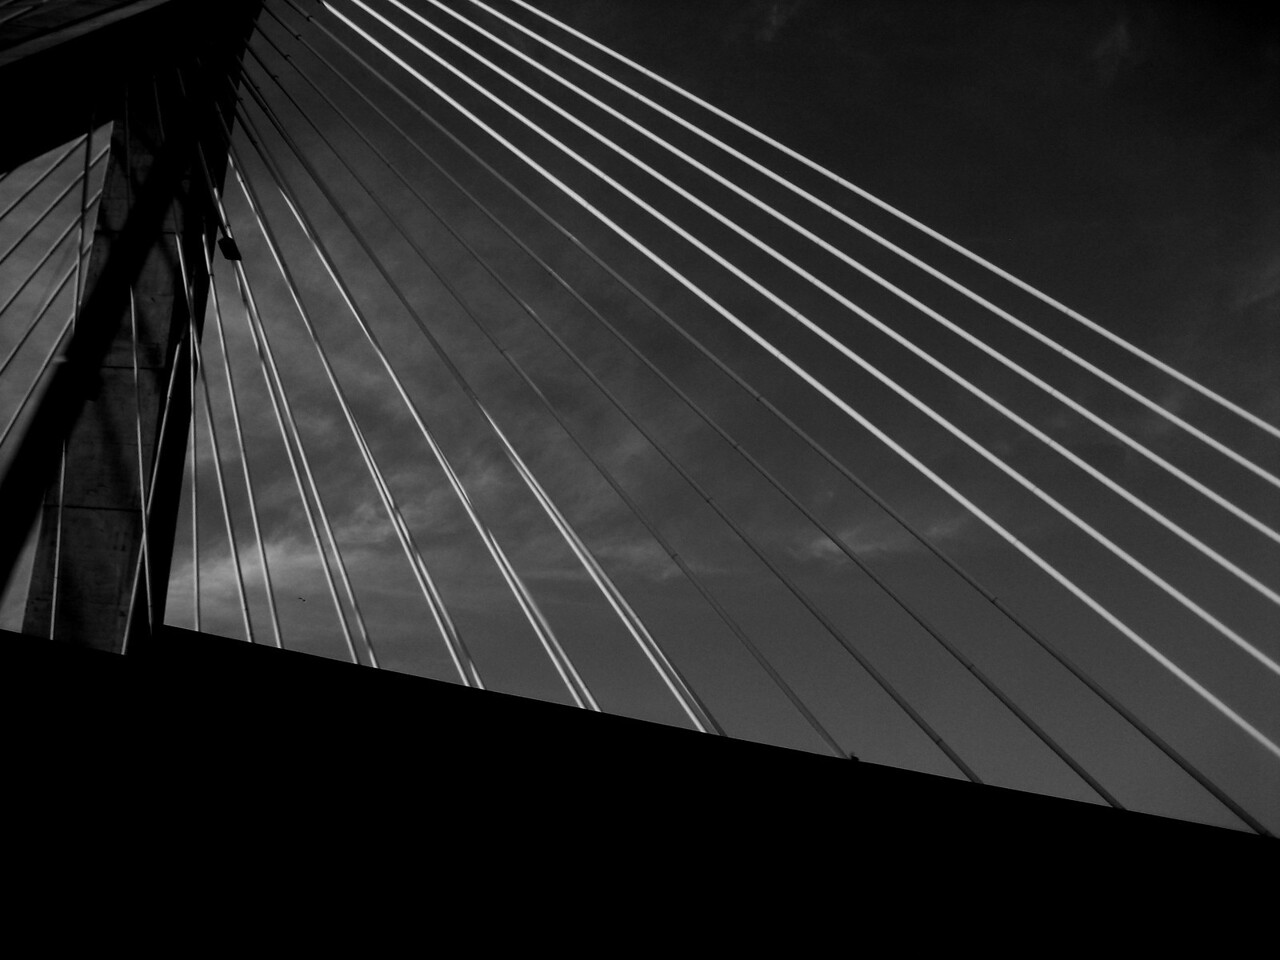 Bridge with darker sky.